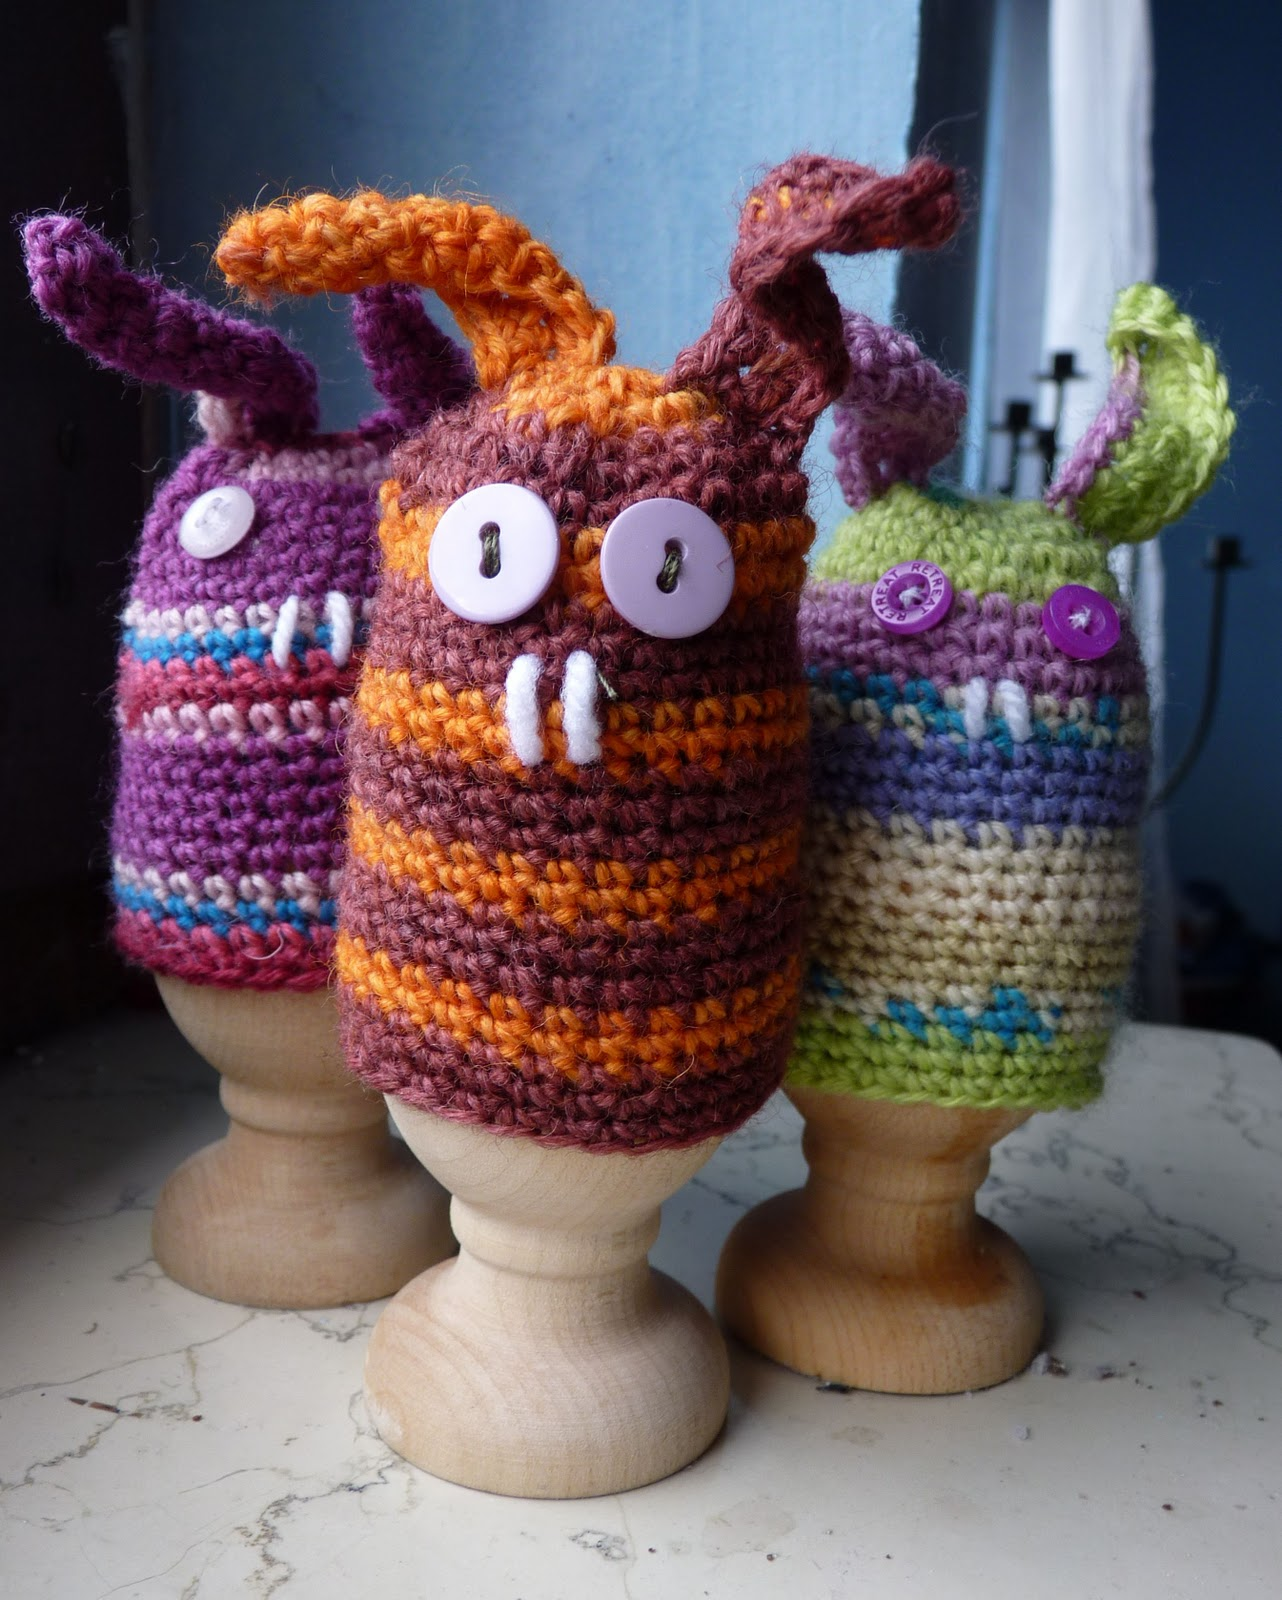 The Gingerbread Lady Killer Bunny Egg Cozy - Easter #crochet